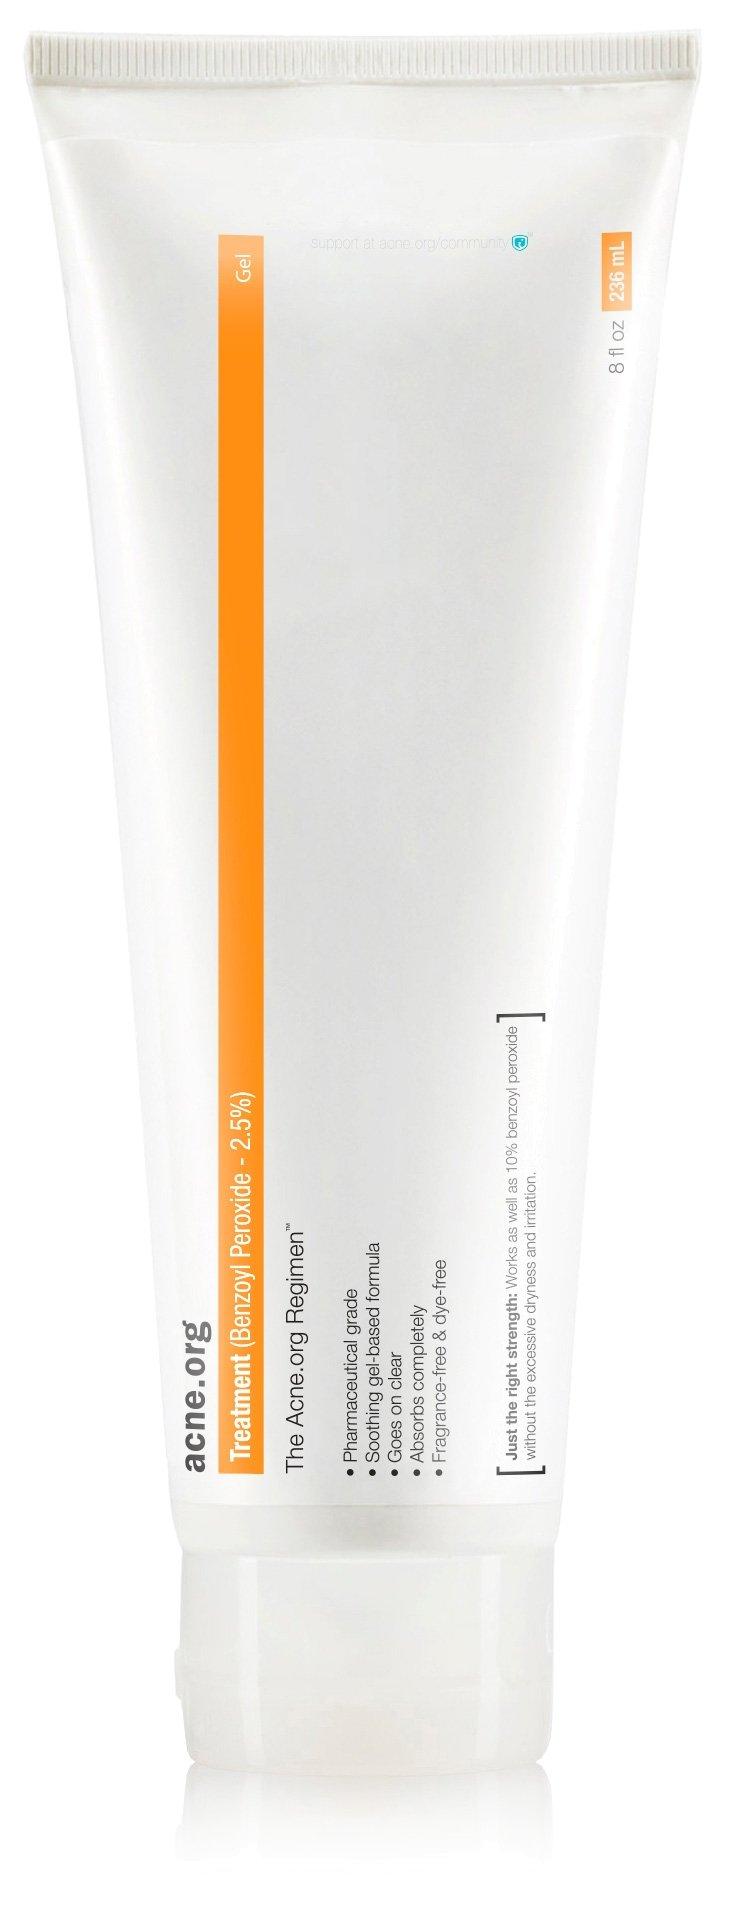 Acne.org 8 oz. Treatment (2.5% Benzoyl Peroxide) by Acne.org